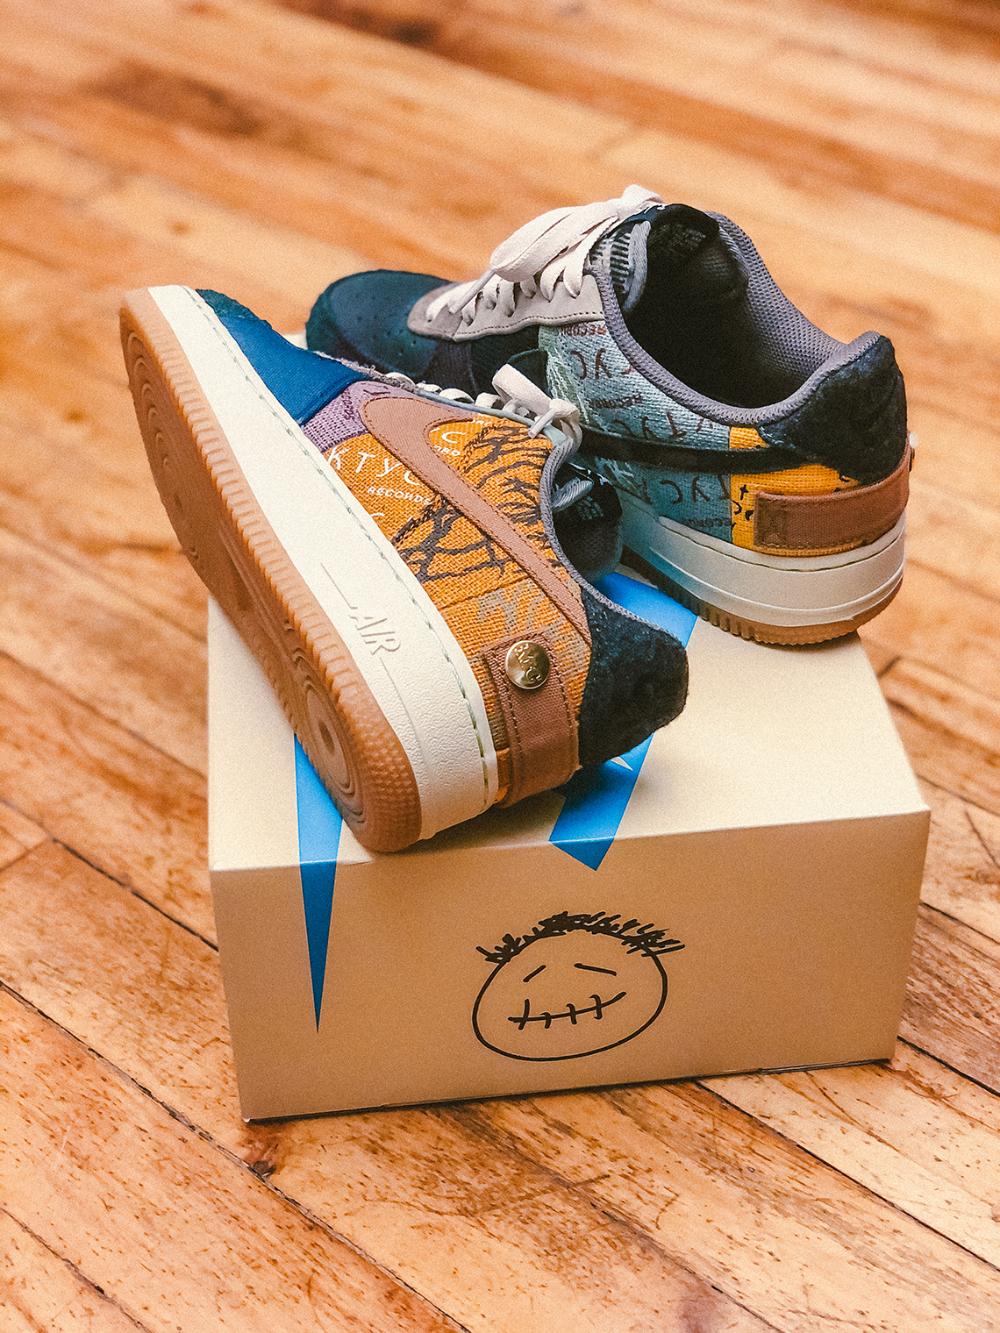 Travis Scott Air Force 1 Shoes Release Date